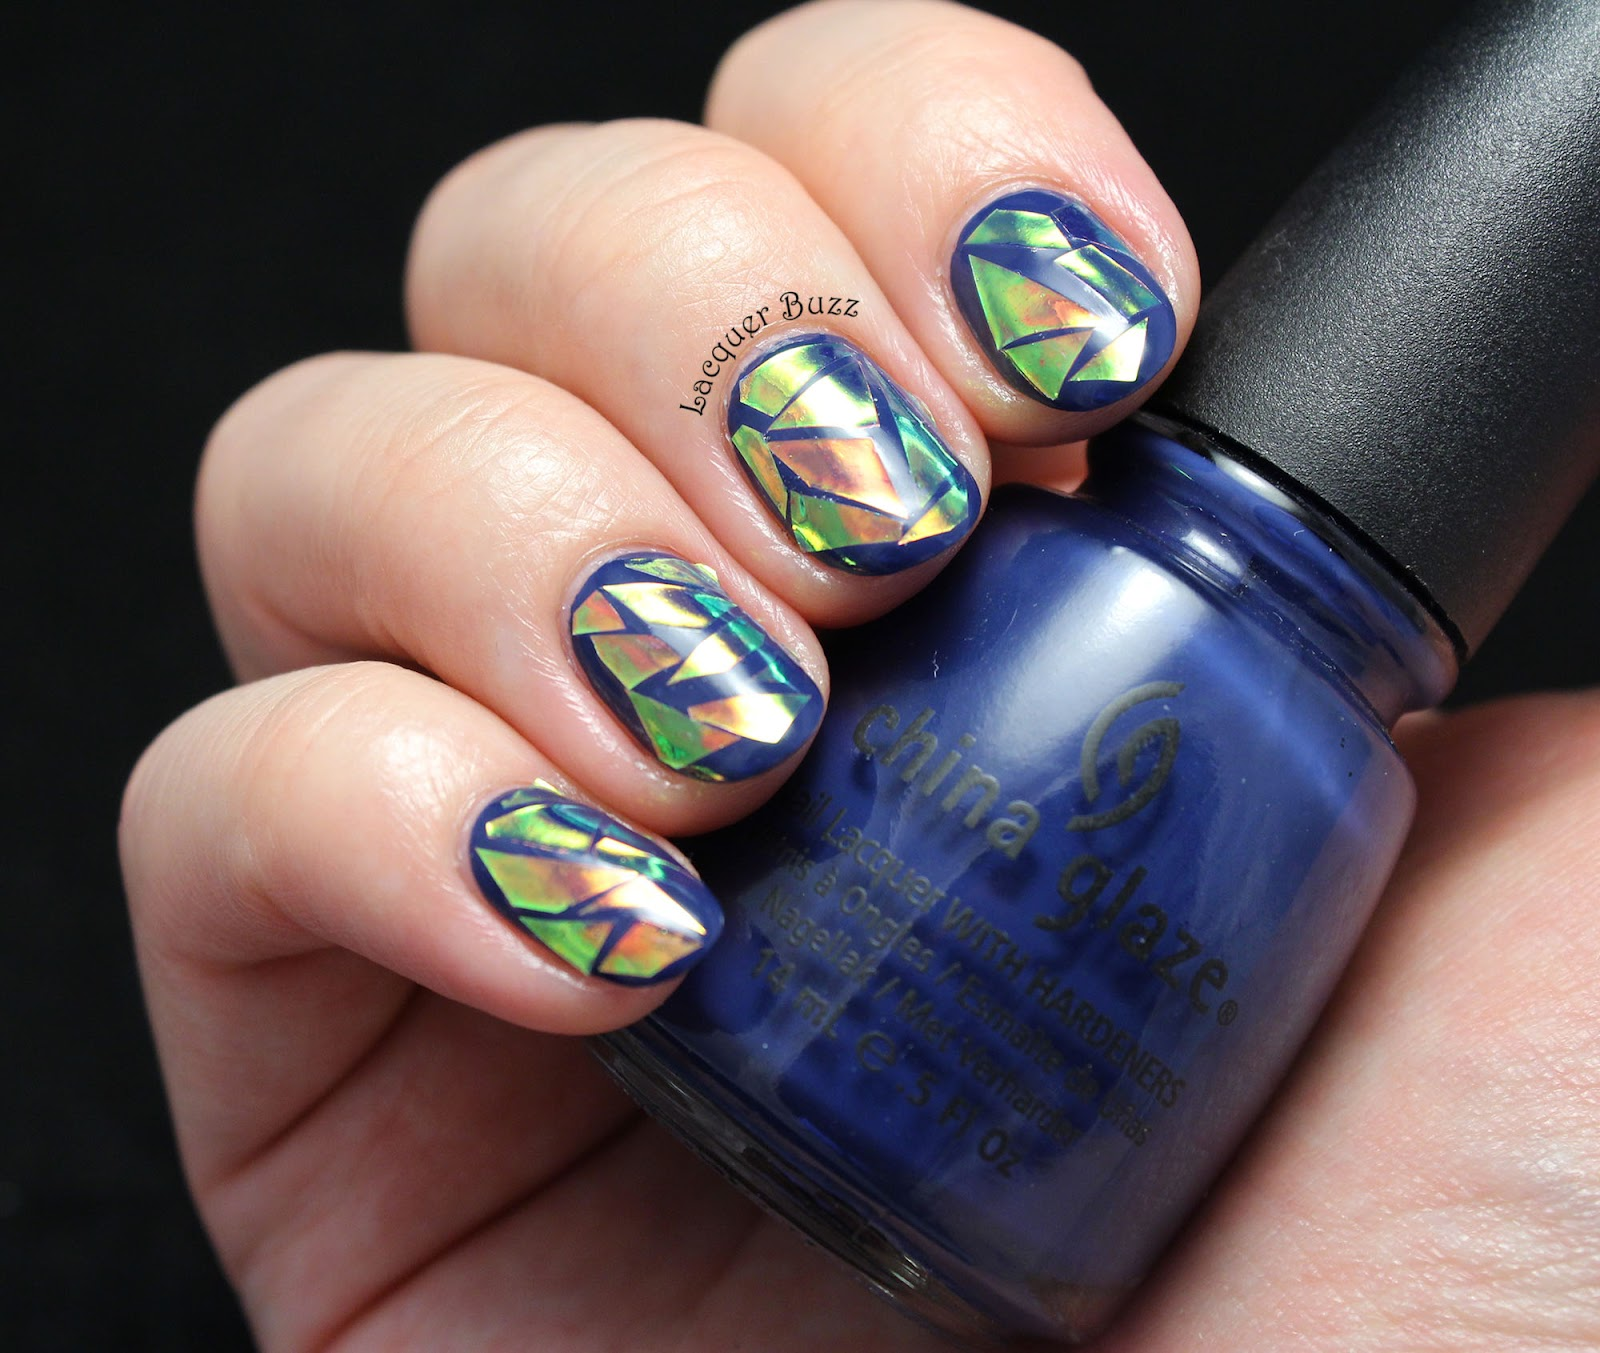 Lacquer Buzz: Monday Blues: Glass Nails